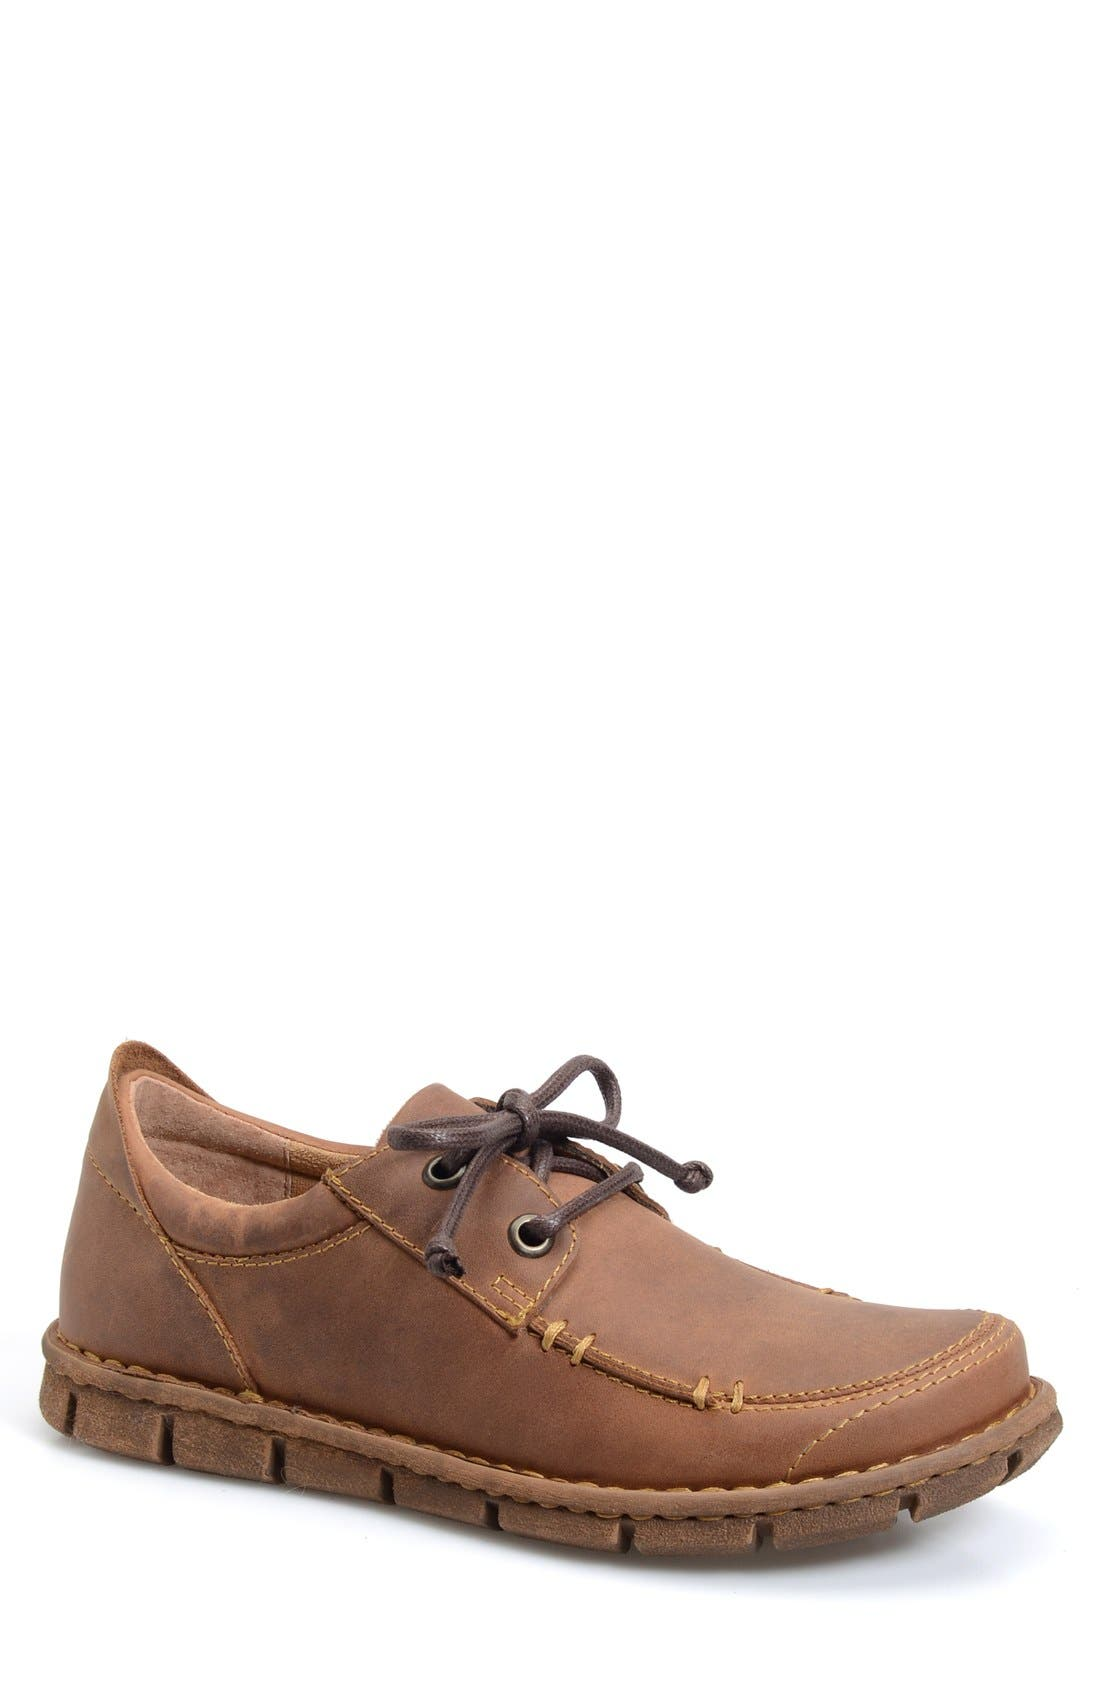 'Joel' Moc Toe Derby,                         Main,                         color, Light Brown Suede